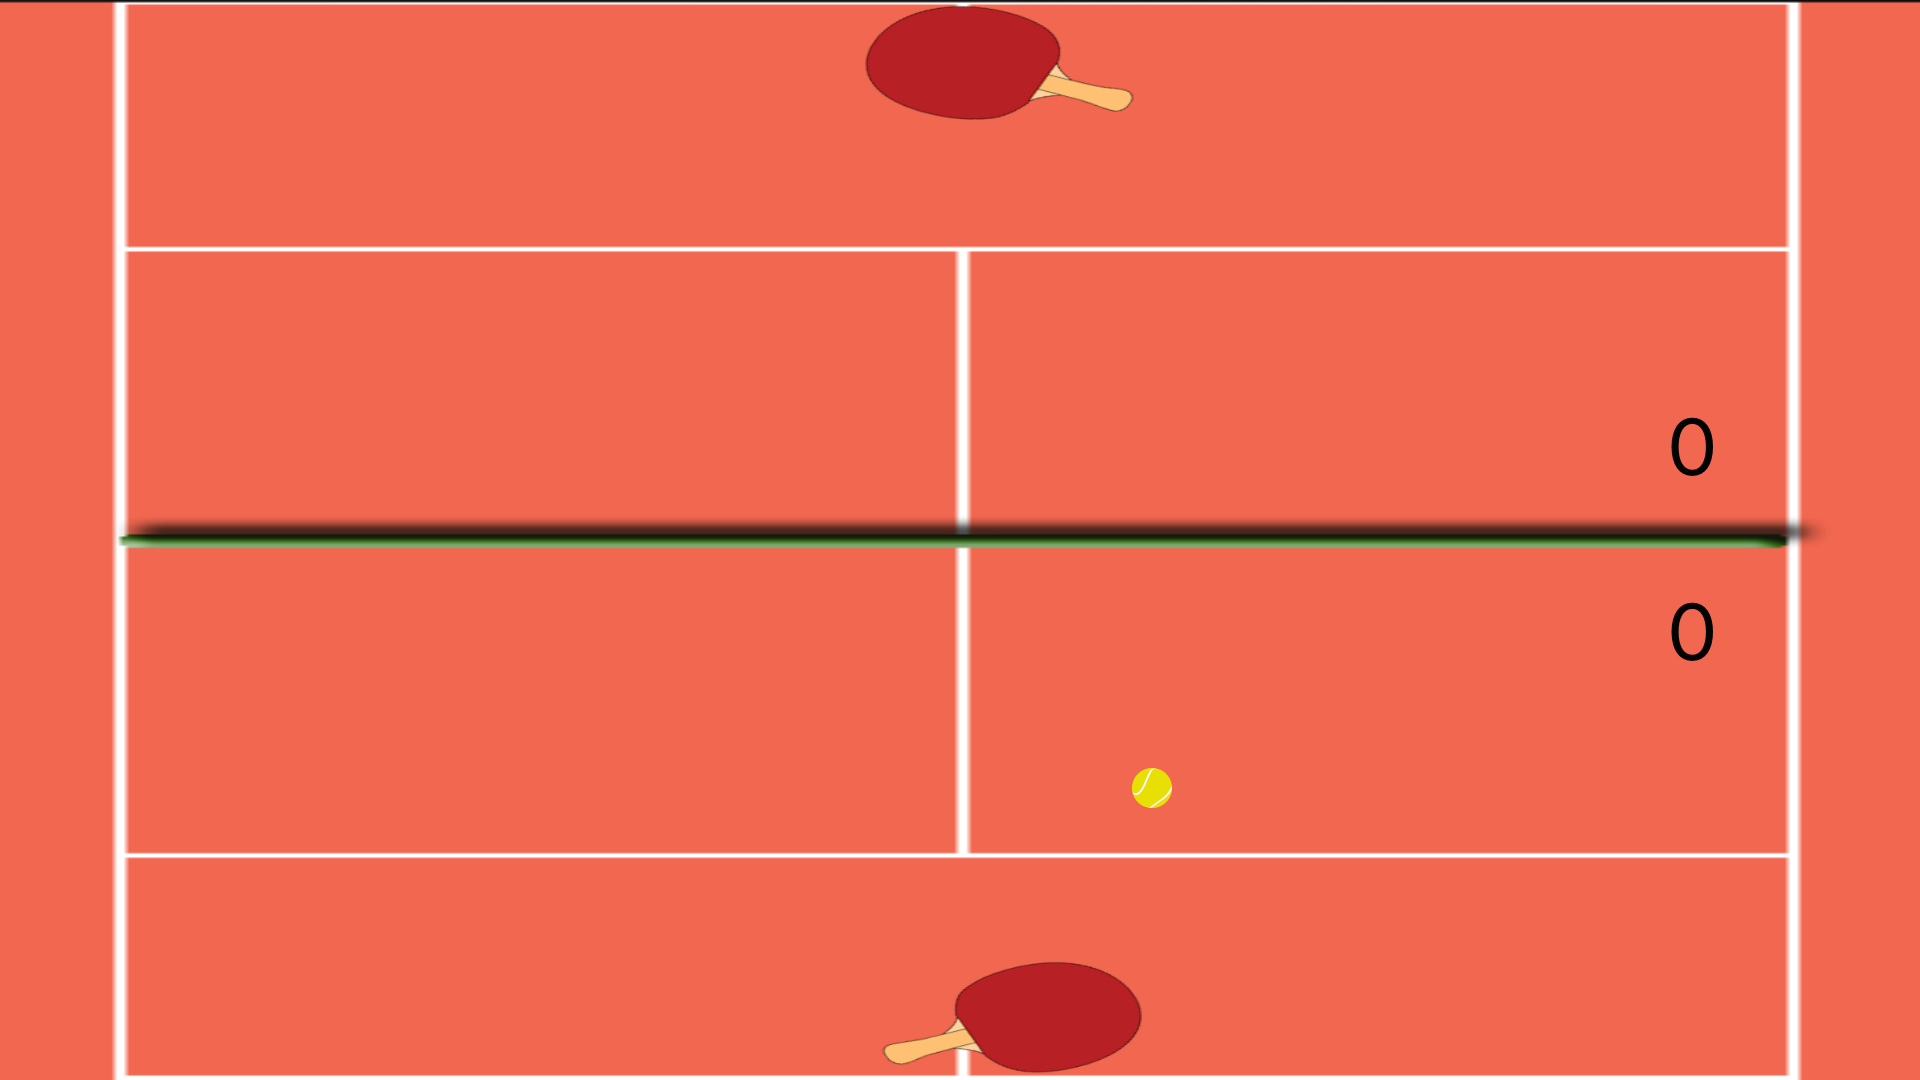 Table Tennis For TV screenshot 4